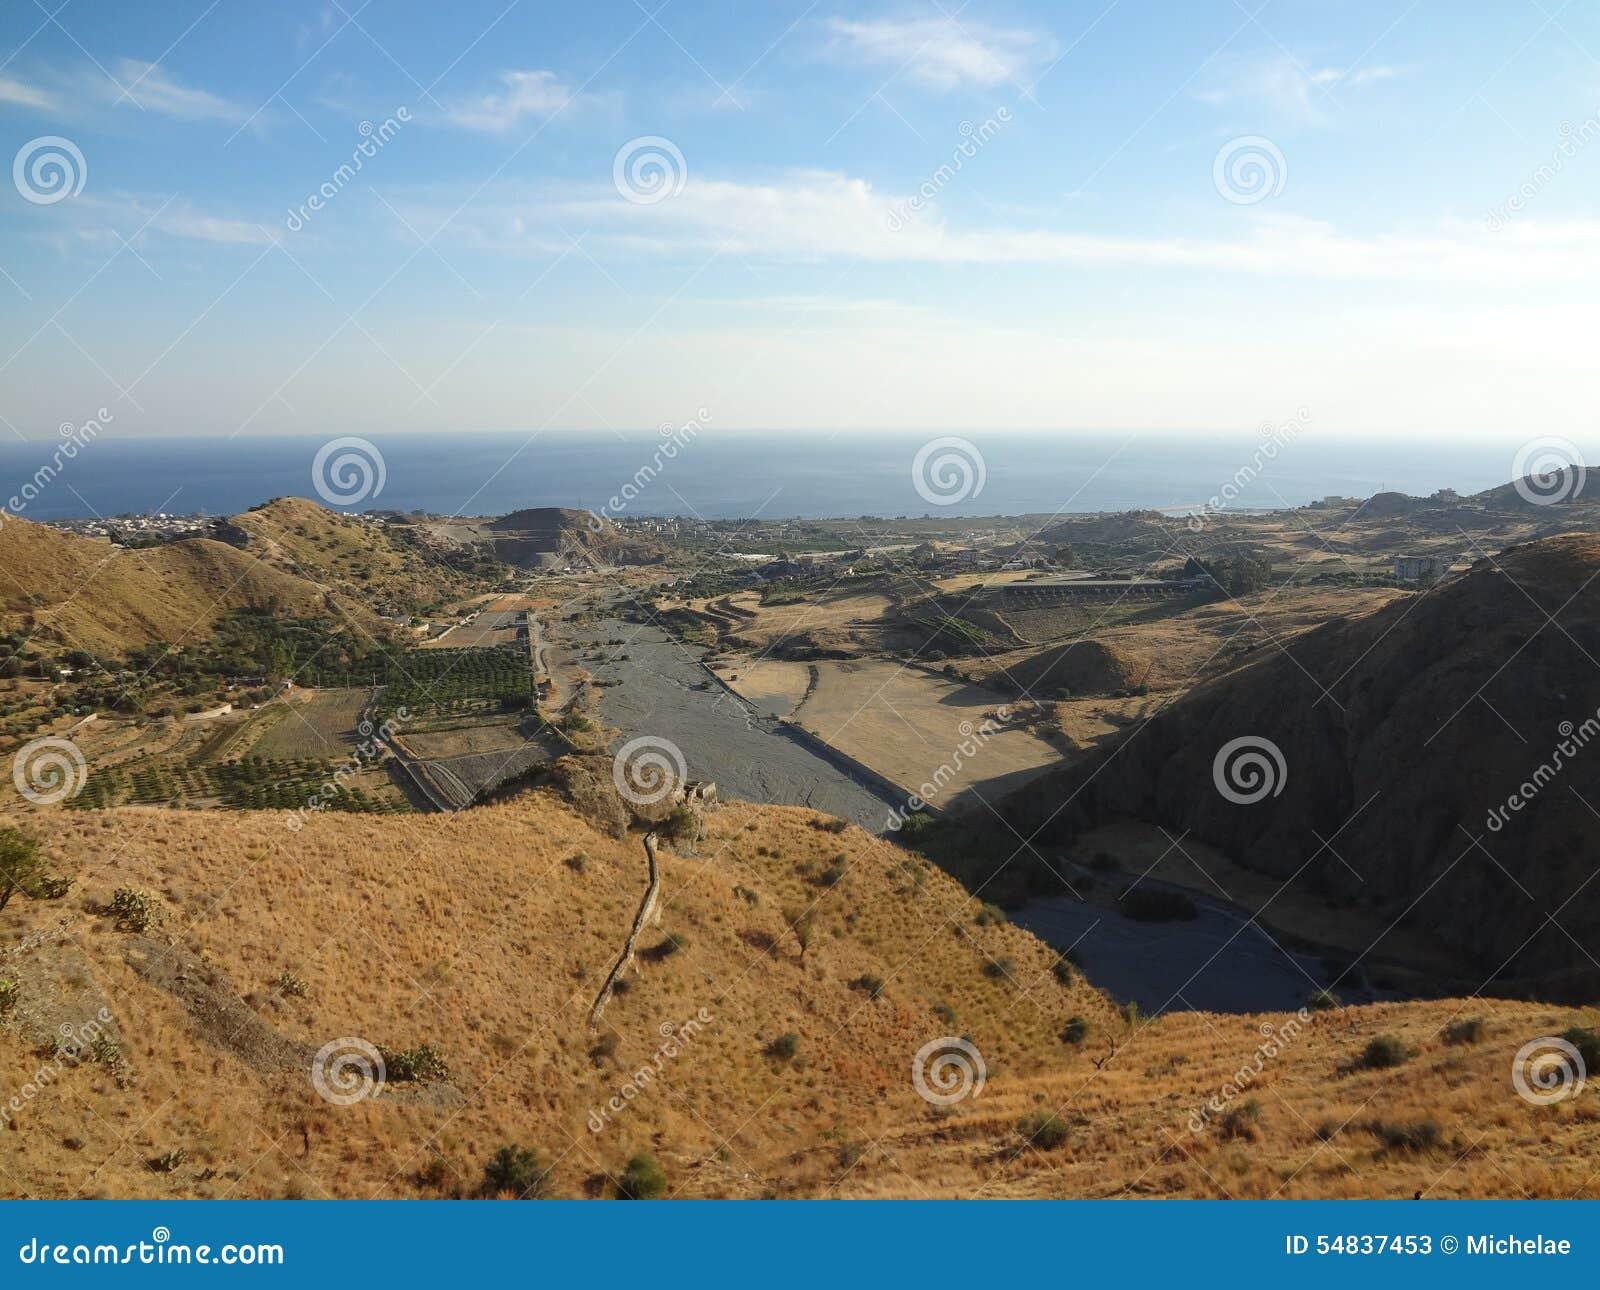 Valley below Pentedattilo